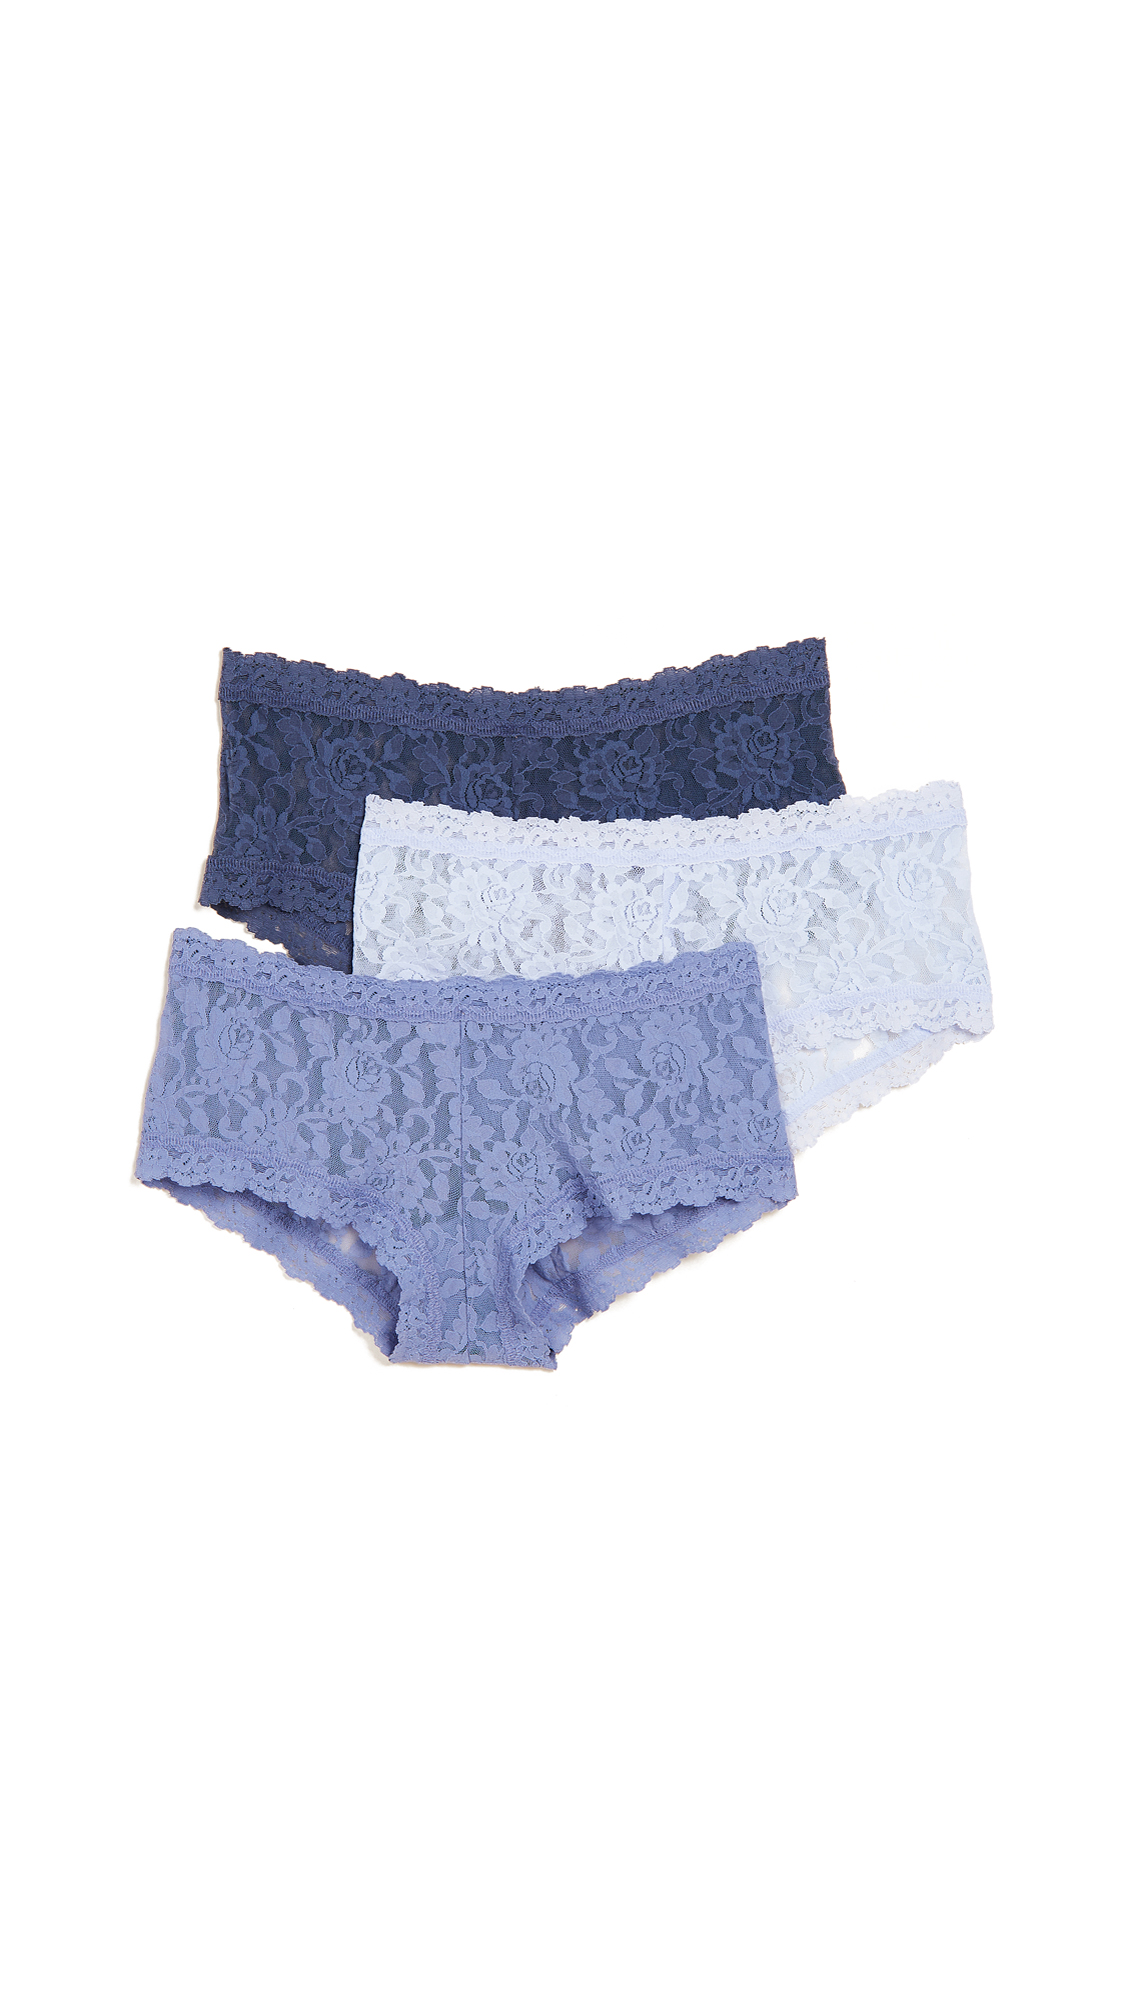 Hanky Panky 3 Pack Signature Lace Something Blue Boy Shorts